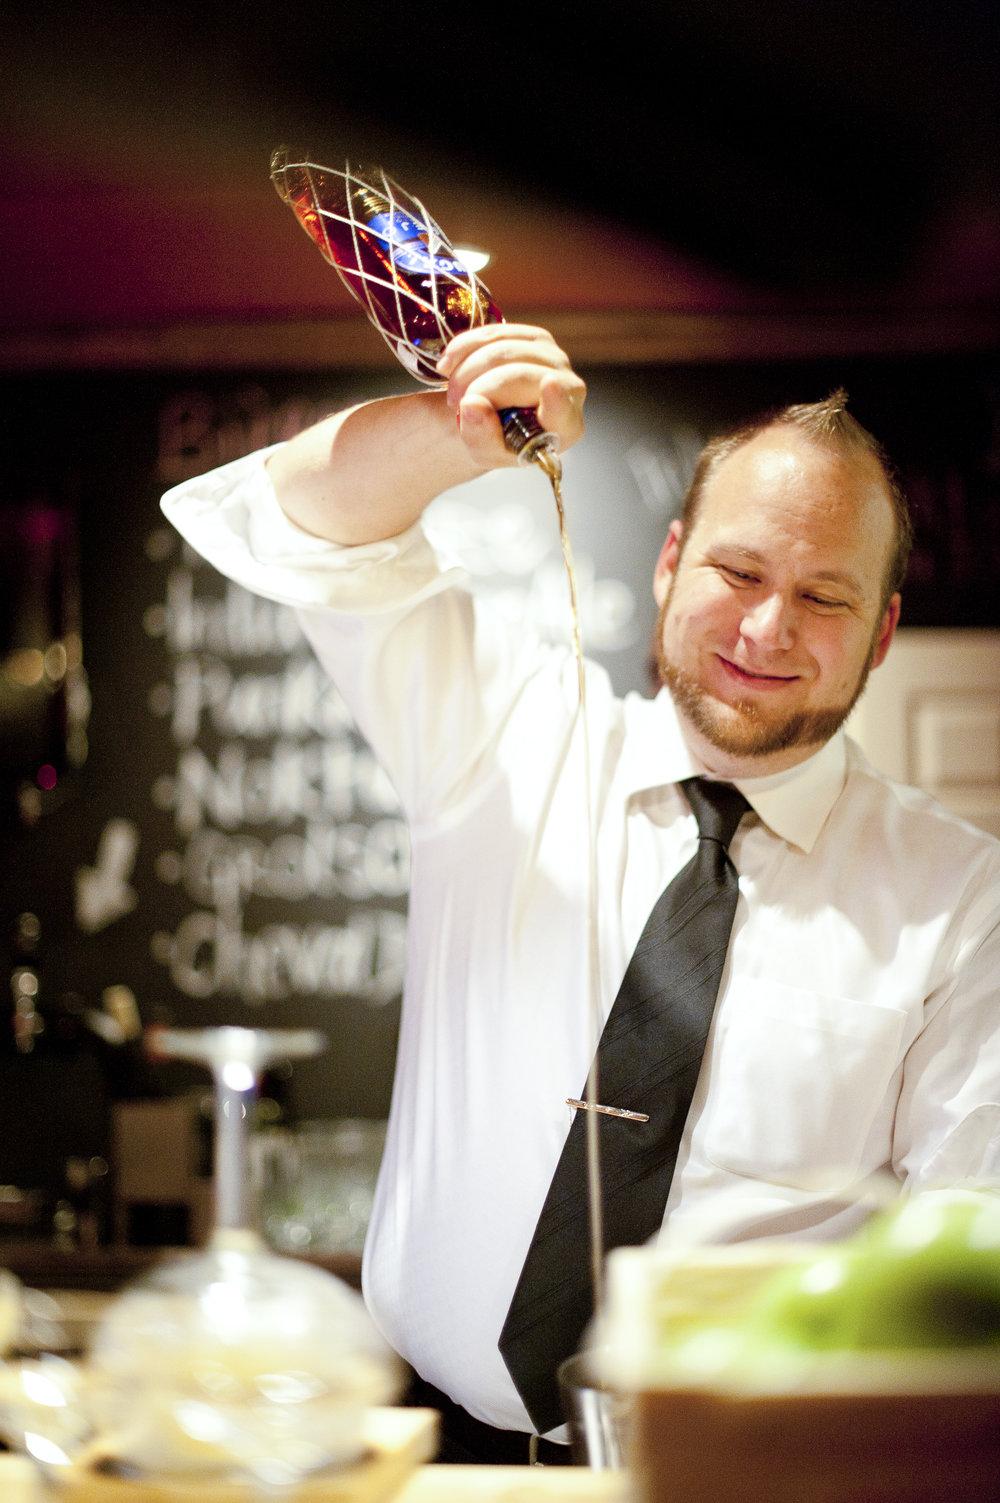 Chef Jason Kacprzak Bistro Kapzak